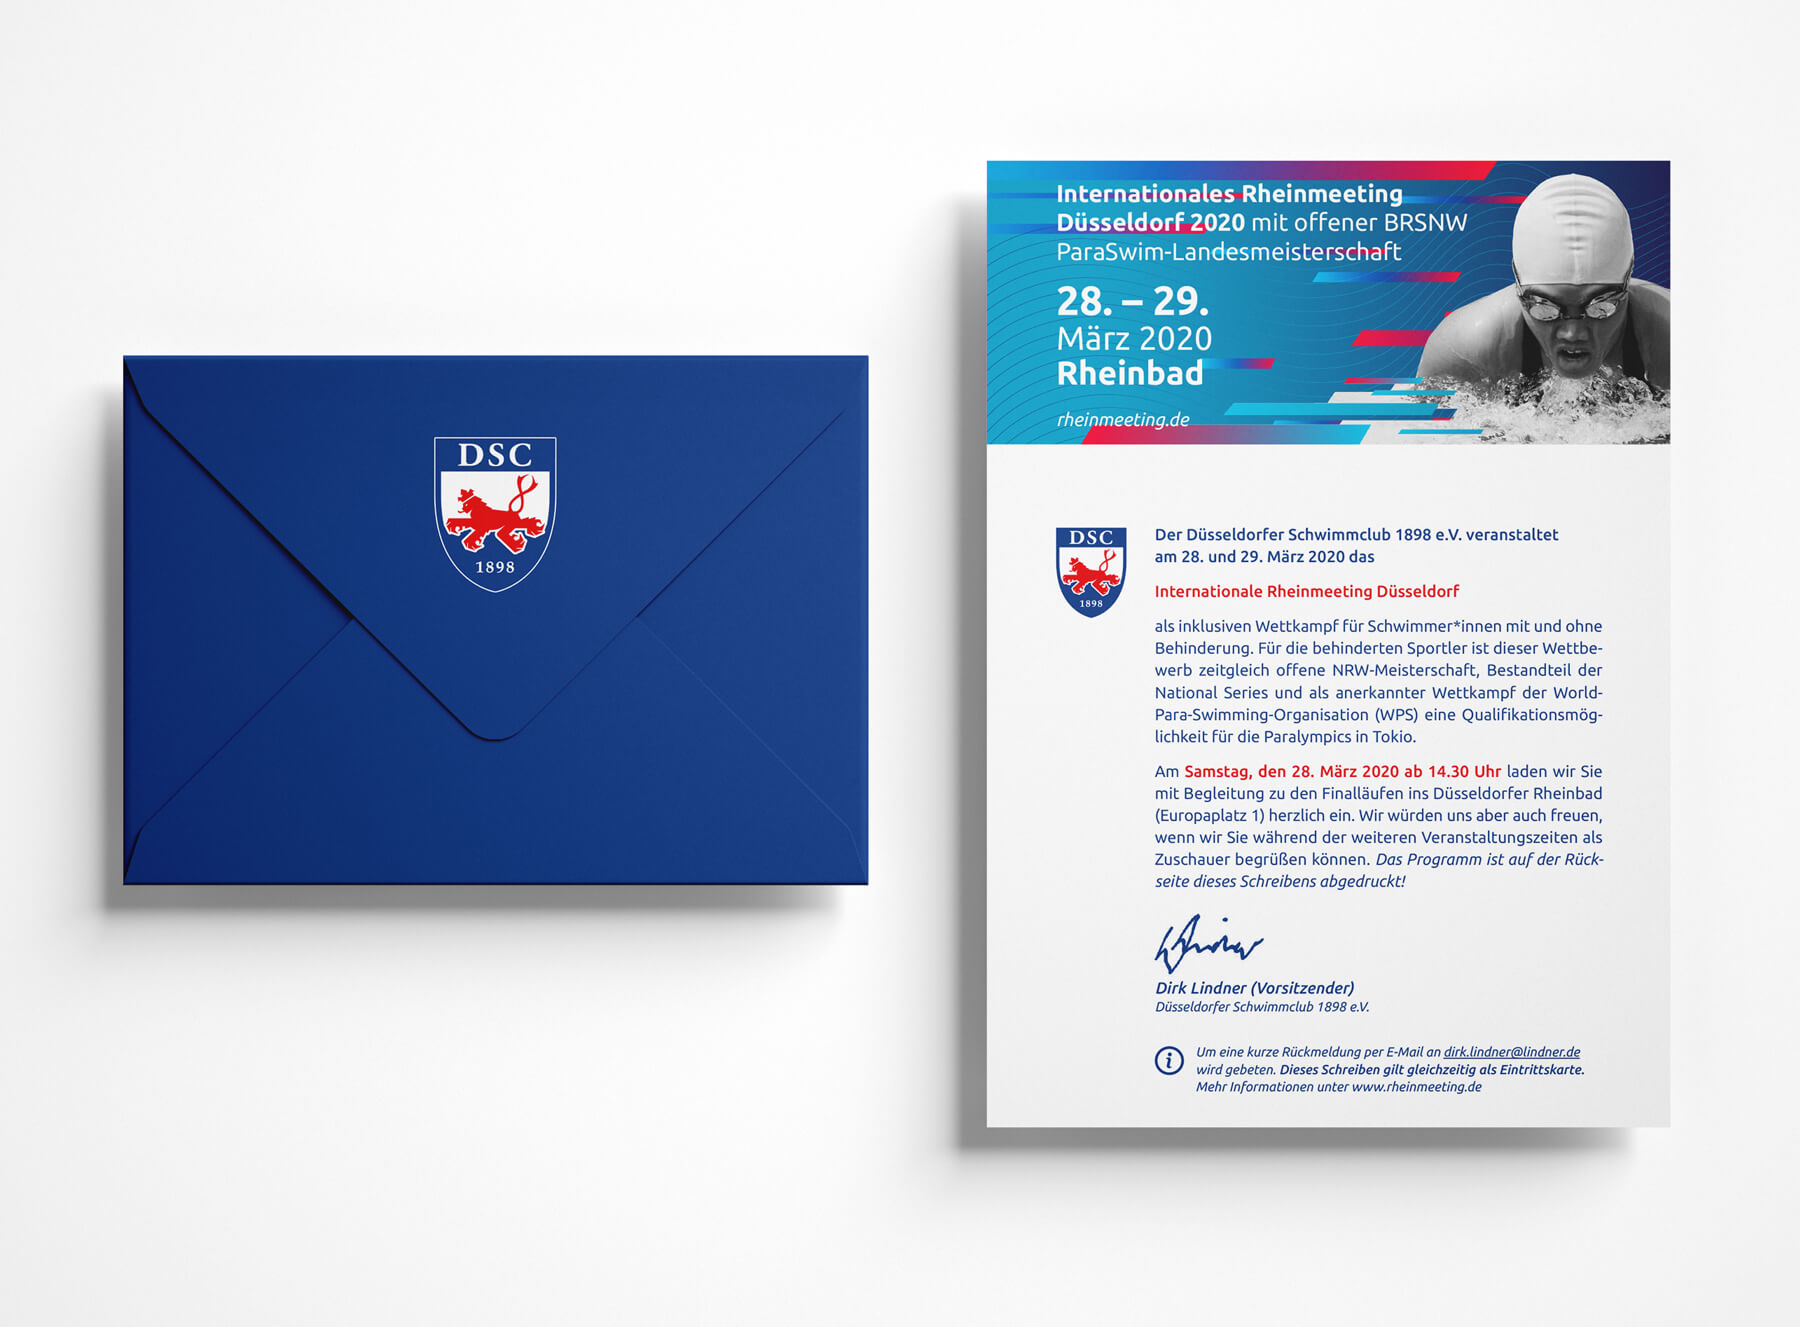 IRM DUS Logo Internationales Rheinmeeting Düsseldorf Eventmarketing Sport Mailing